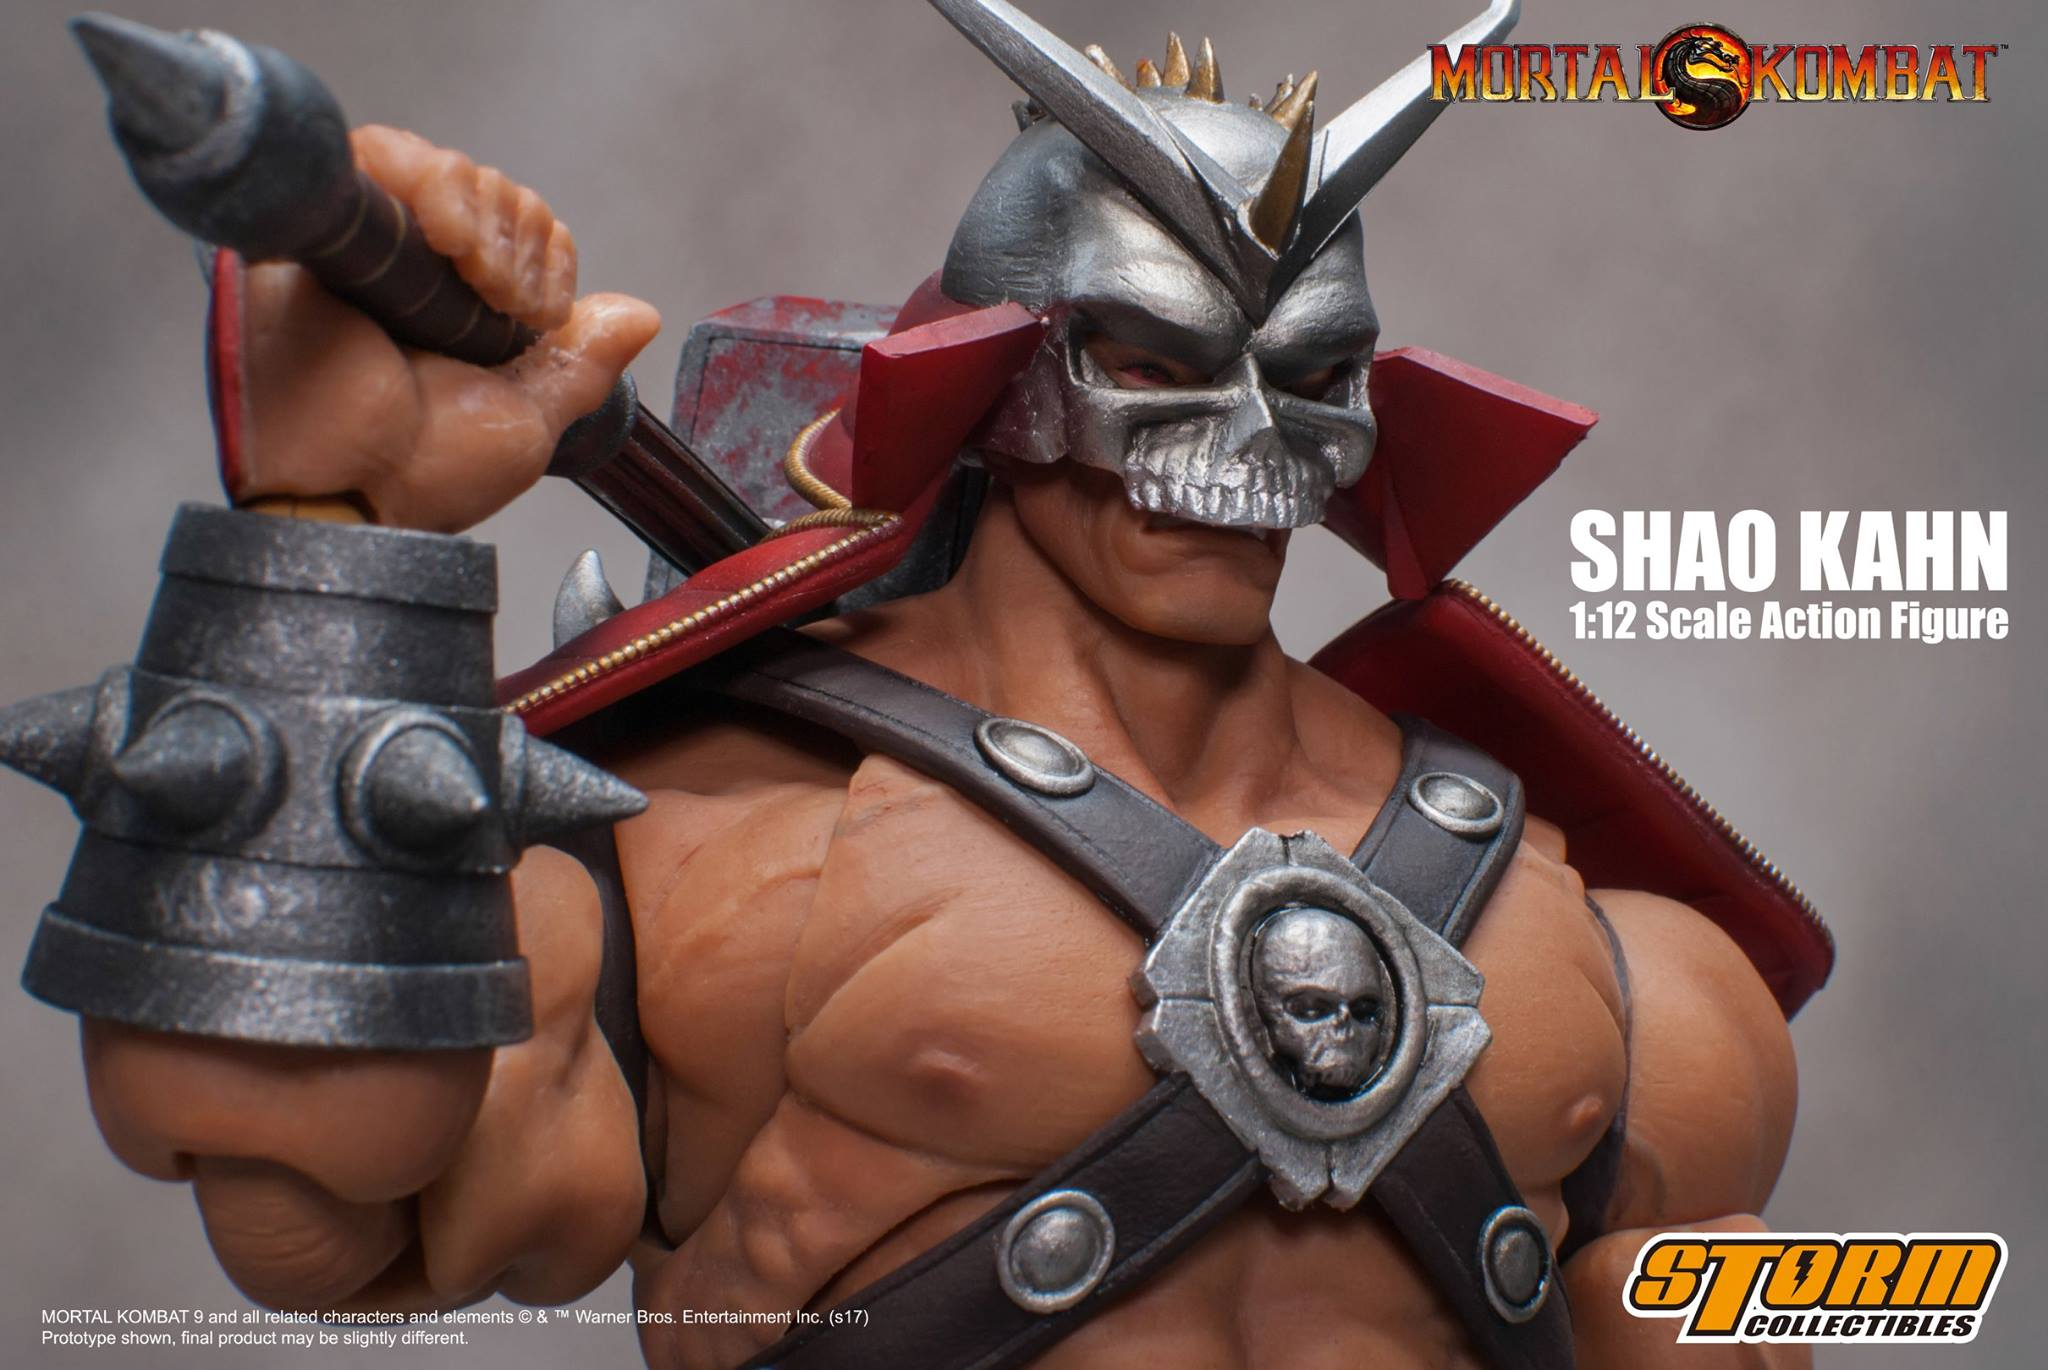 Storm-Mortal-Kombat-Shao-Kahn-012